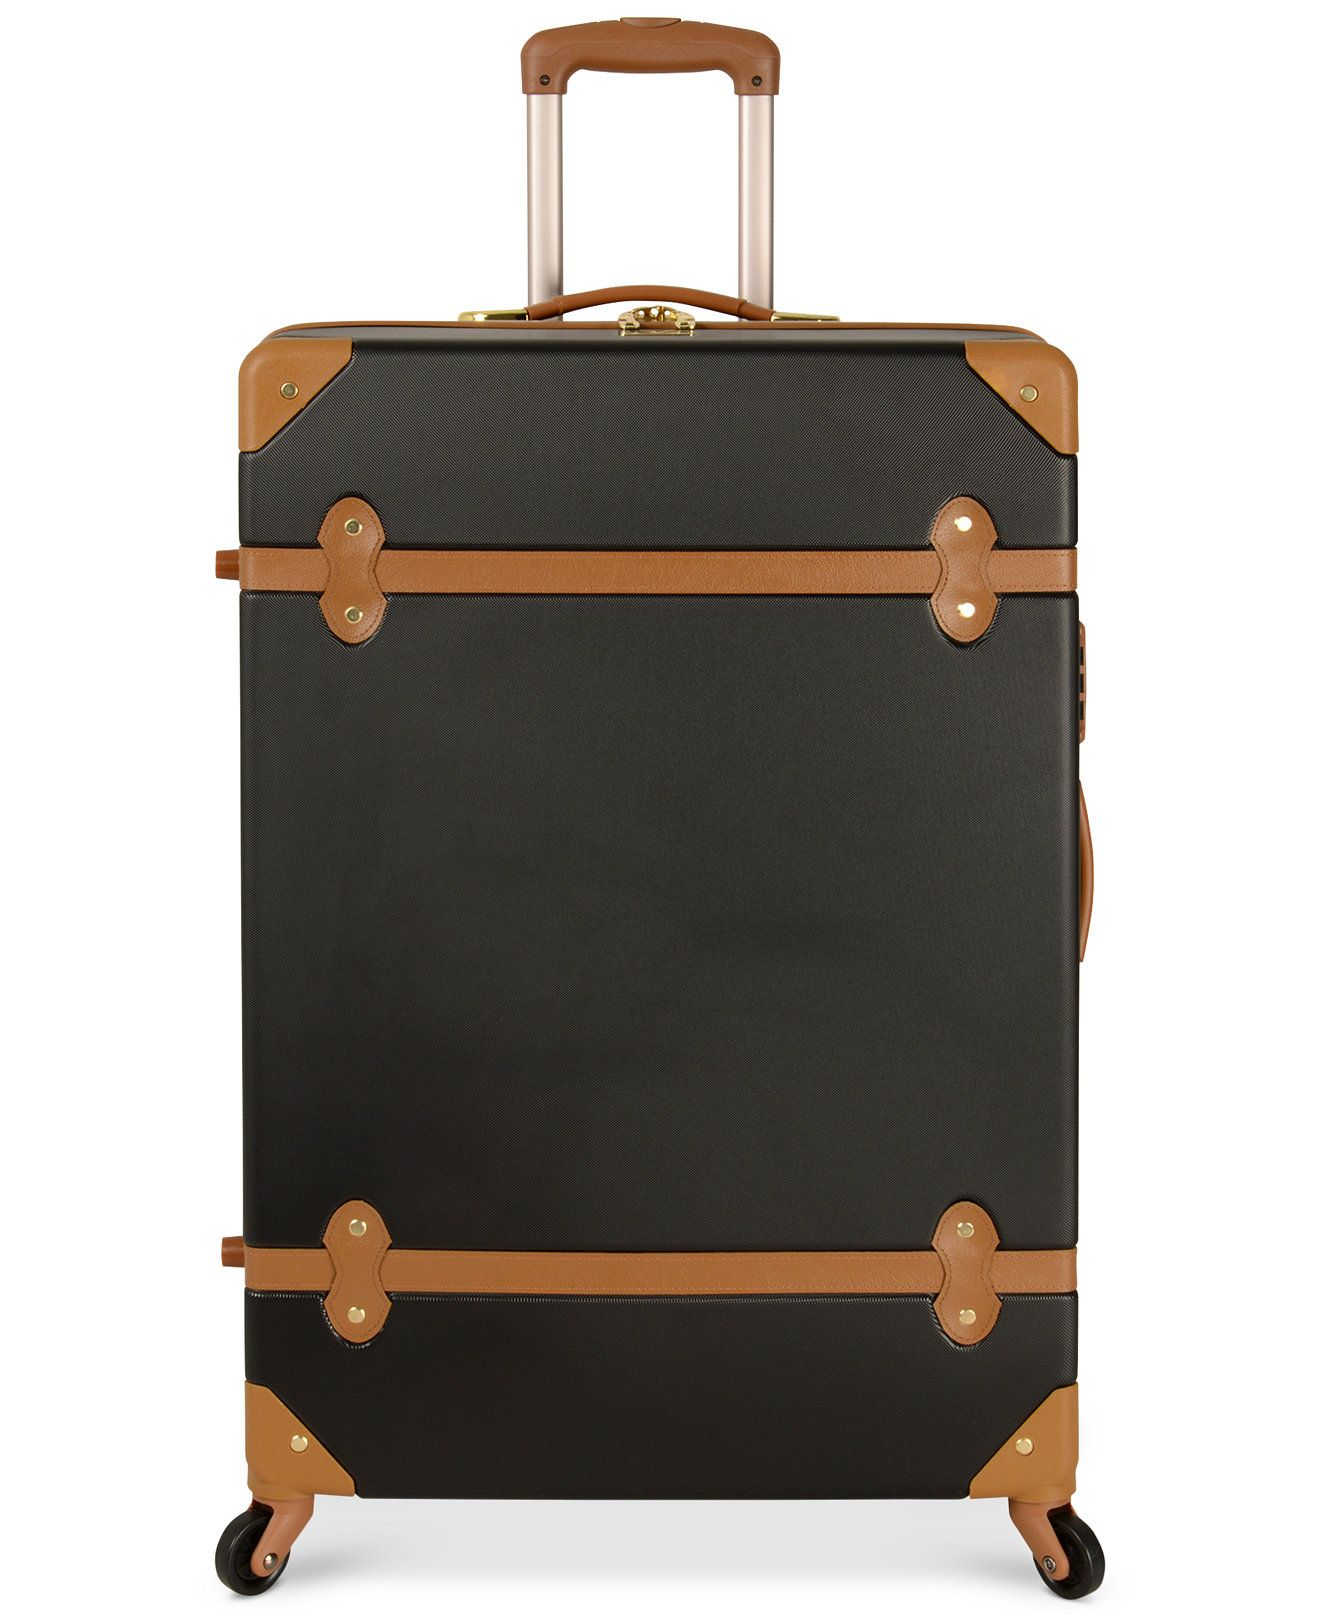 "Diane von Furstenberg Adieu 28"" Hardside Spinner Suitcase - Luggage Collections - luggage - Macy's"